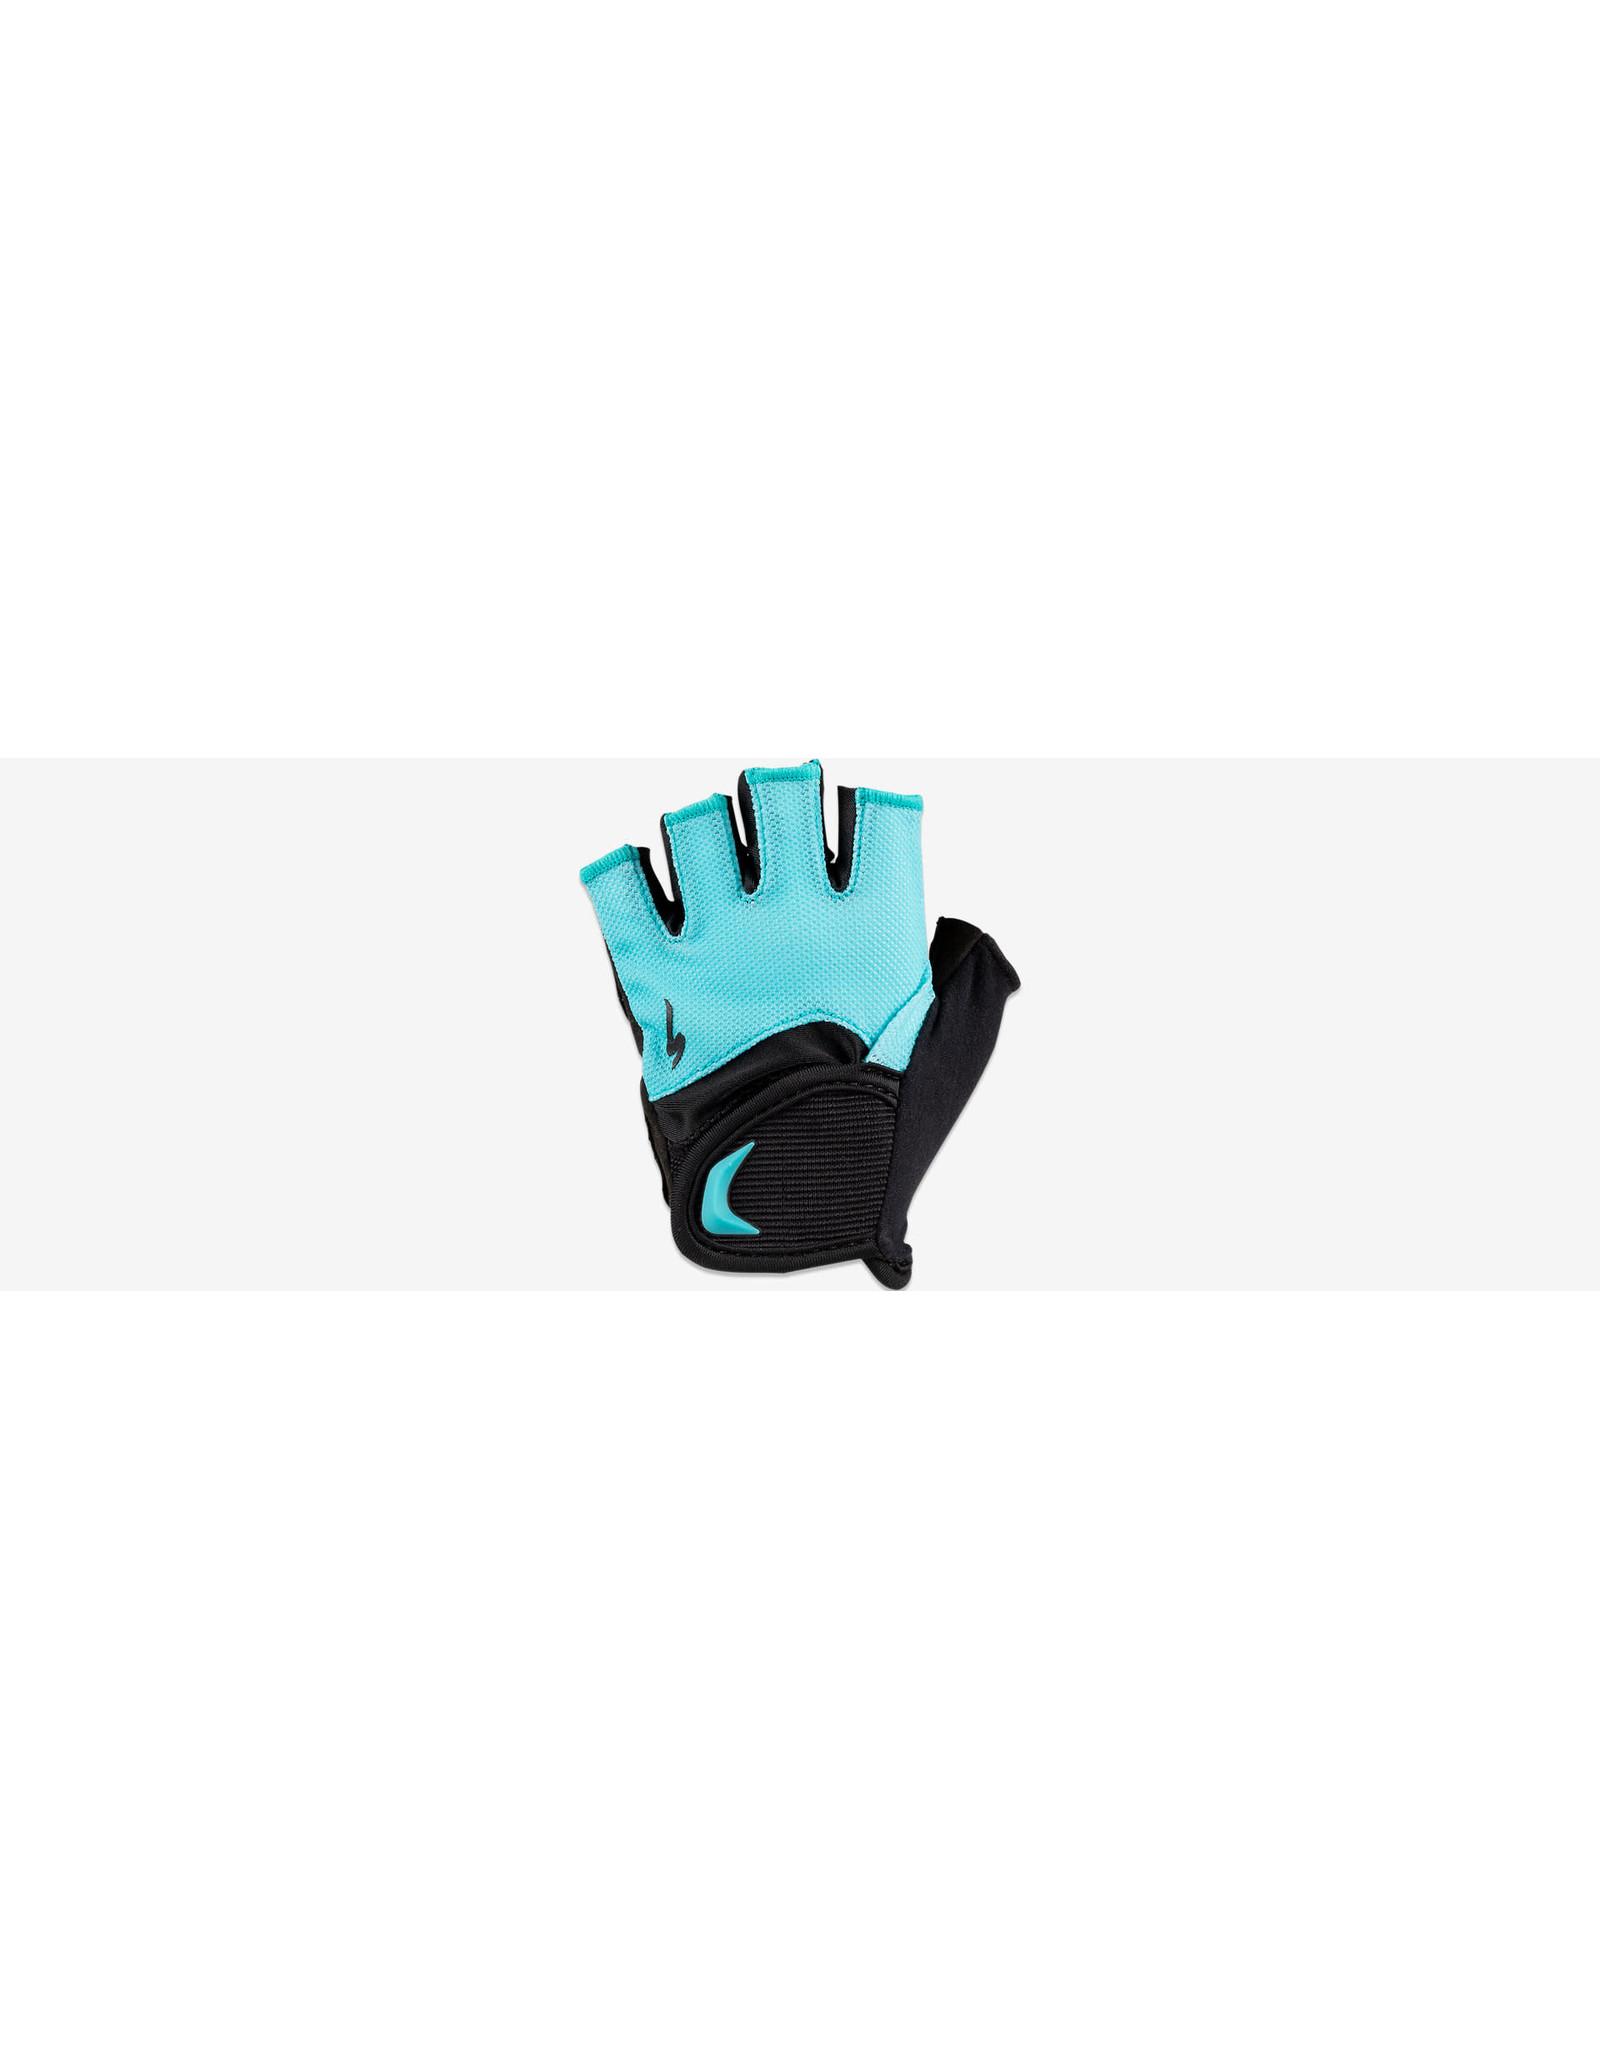 Specialized Glove Spec BG Kids Aqa Medium